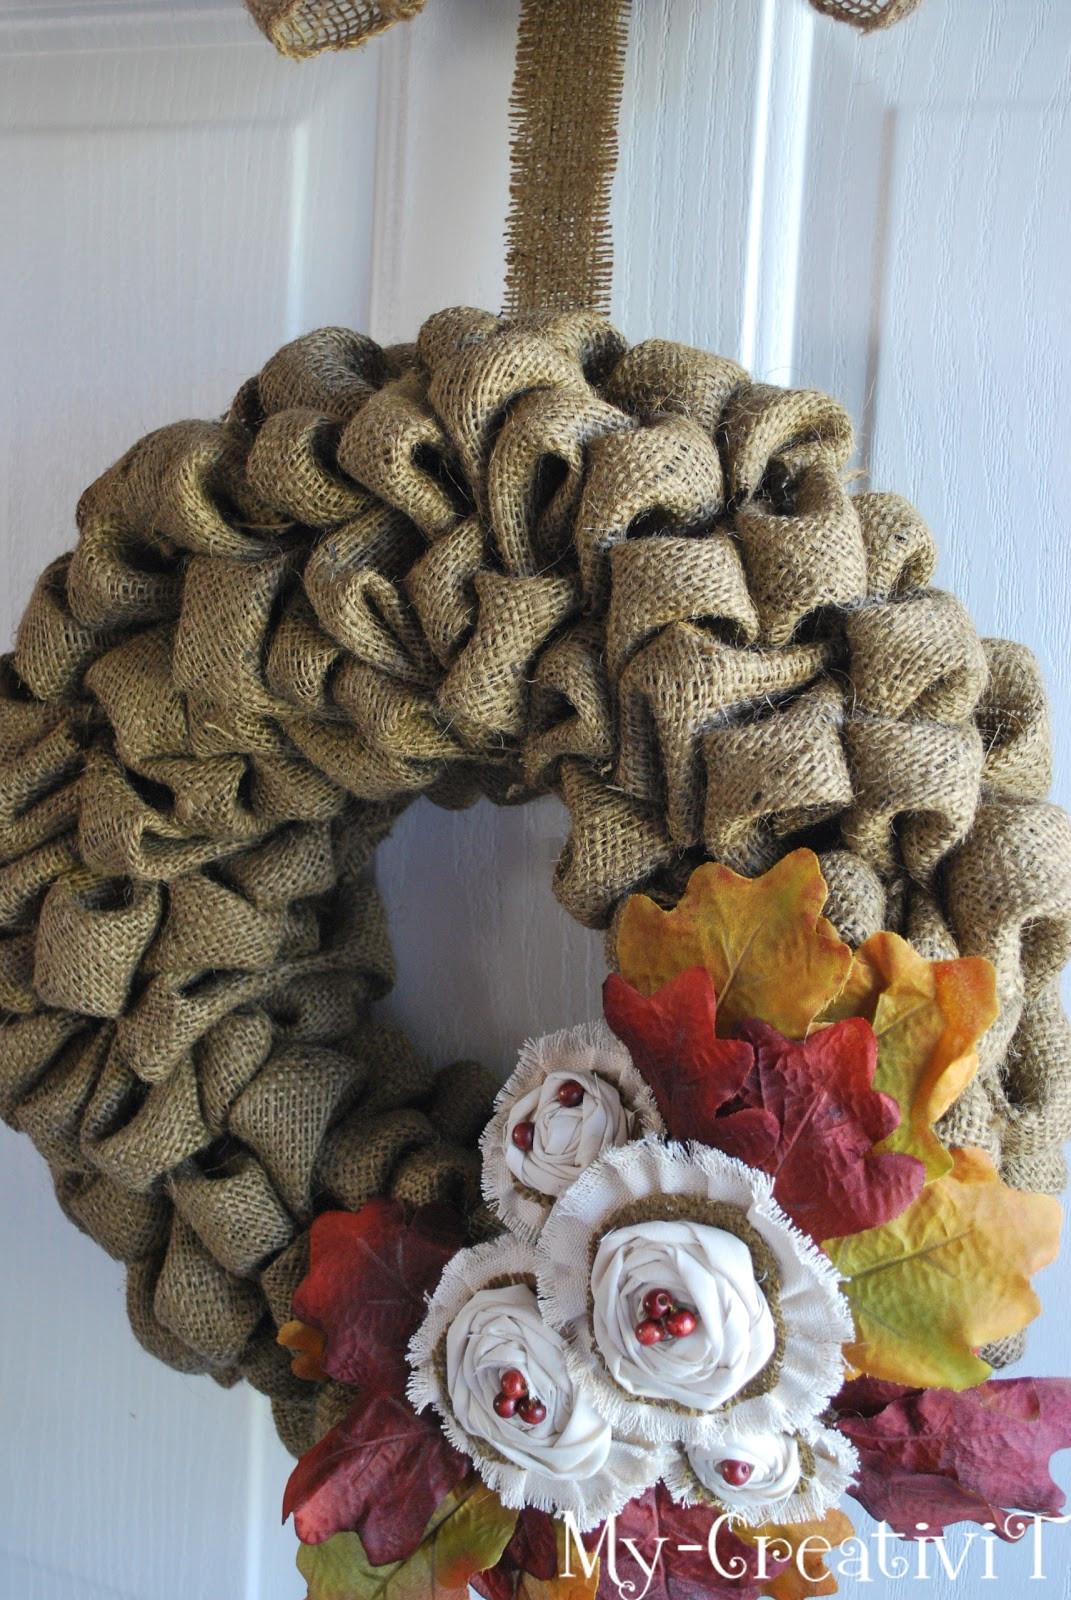 Best ideas about Burlap Wreath DIY . Save or Pin My CreativiT DIY Burlap Wreath Now.